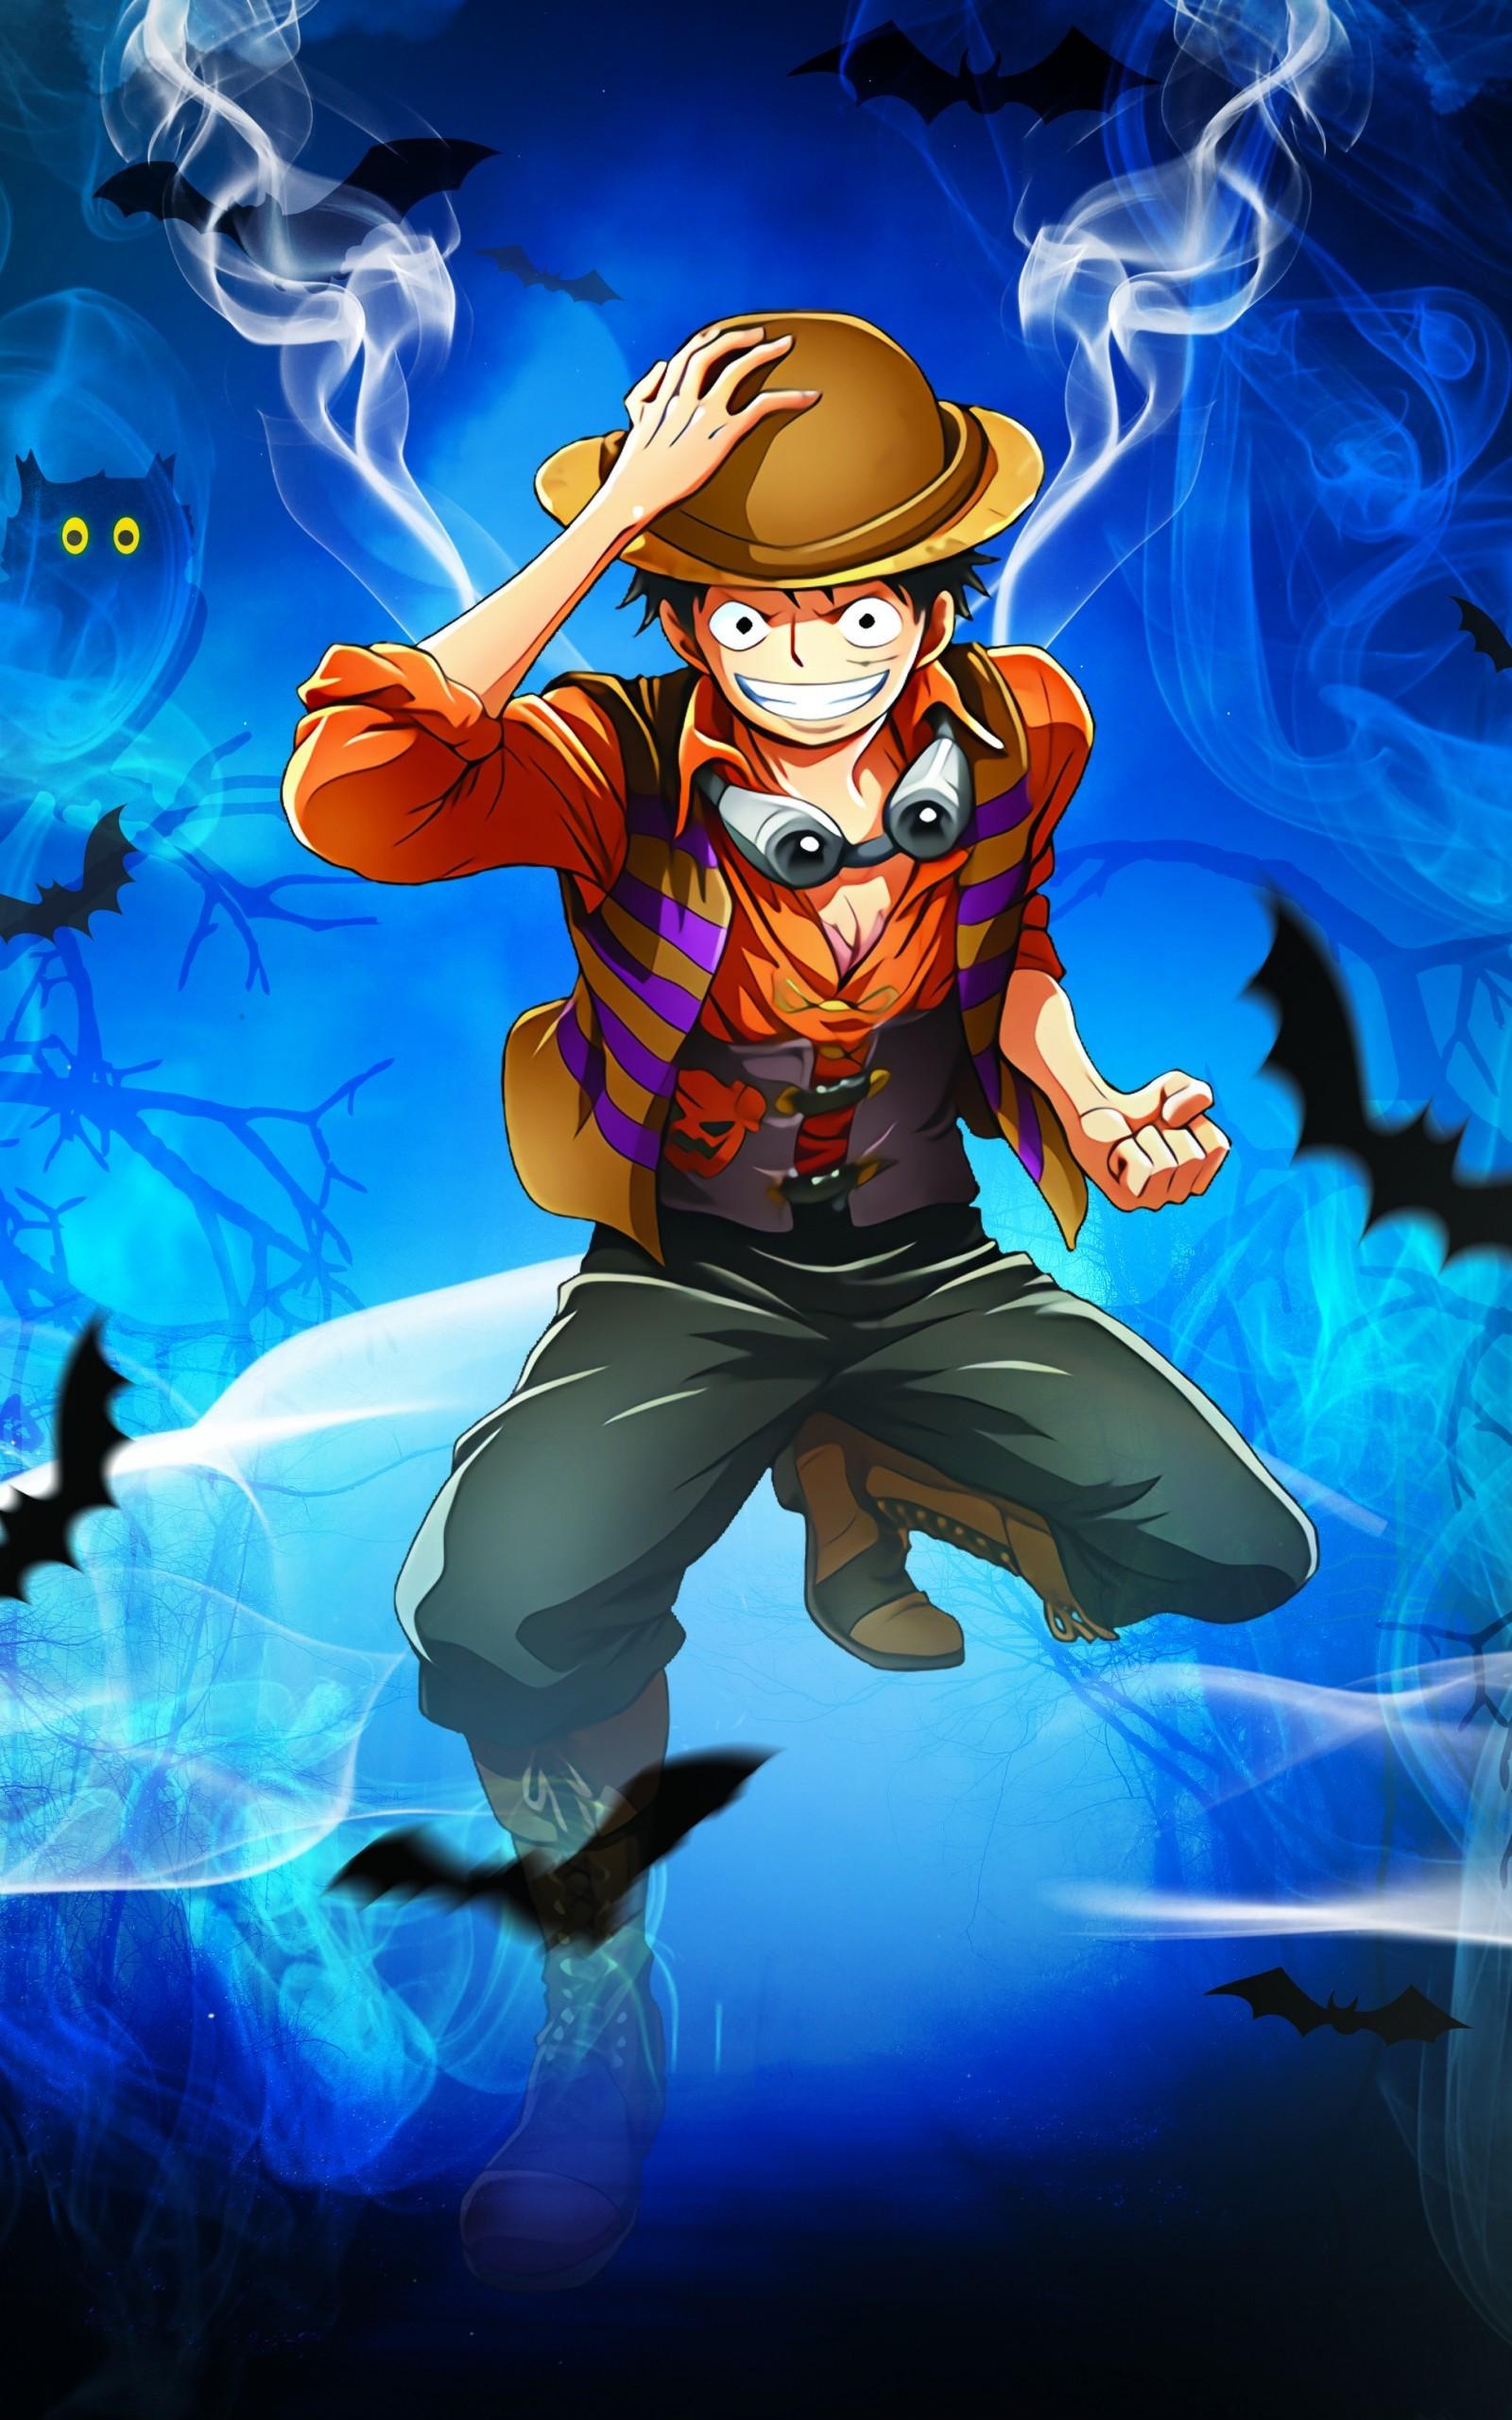 Wallpaper Anime 3d One Piece gambar ke 10